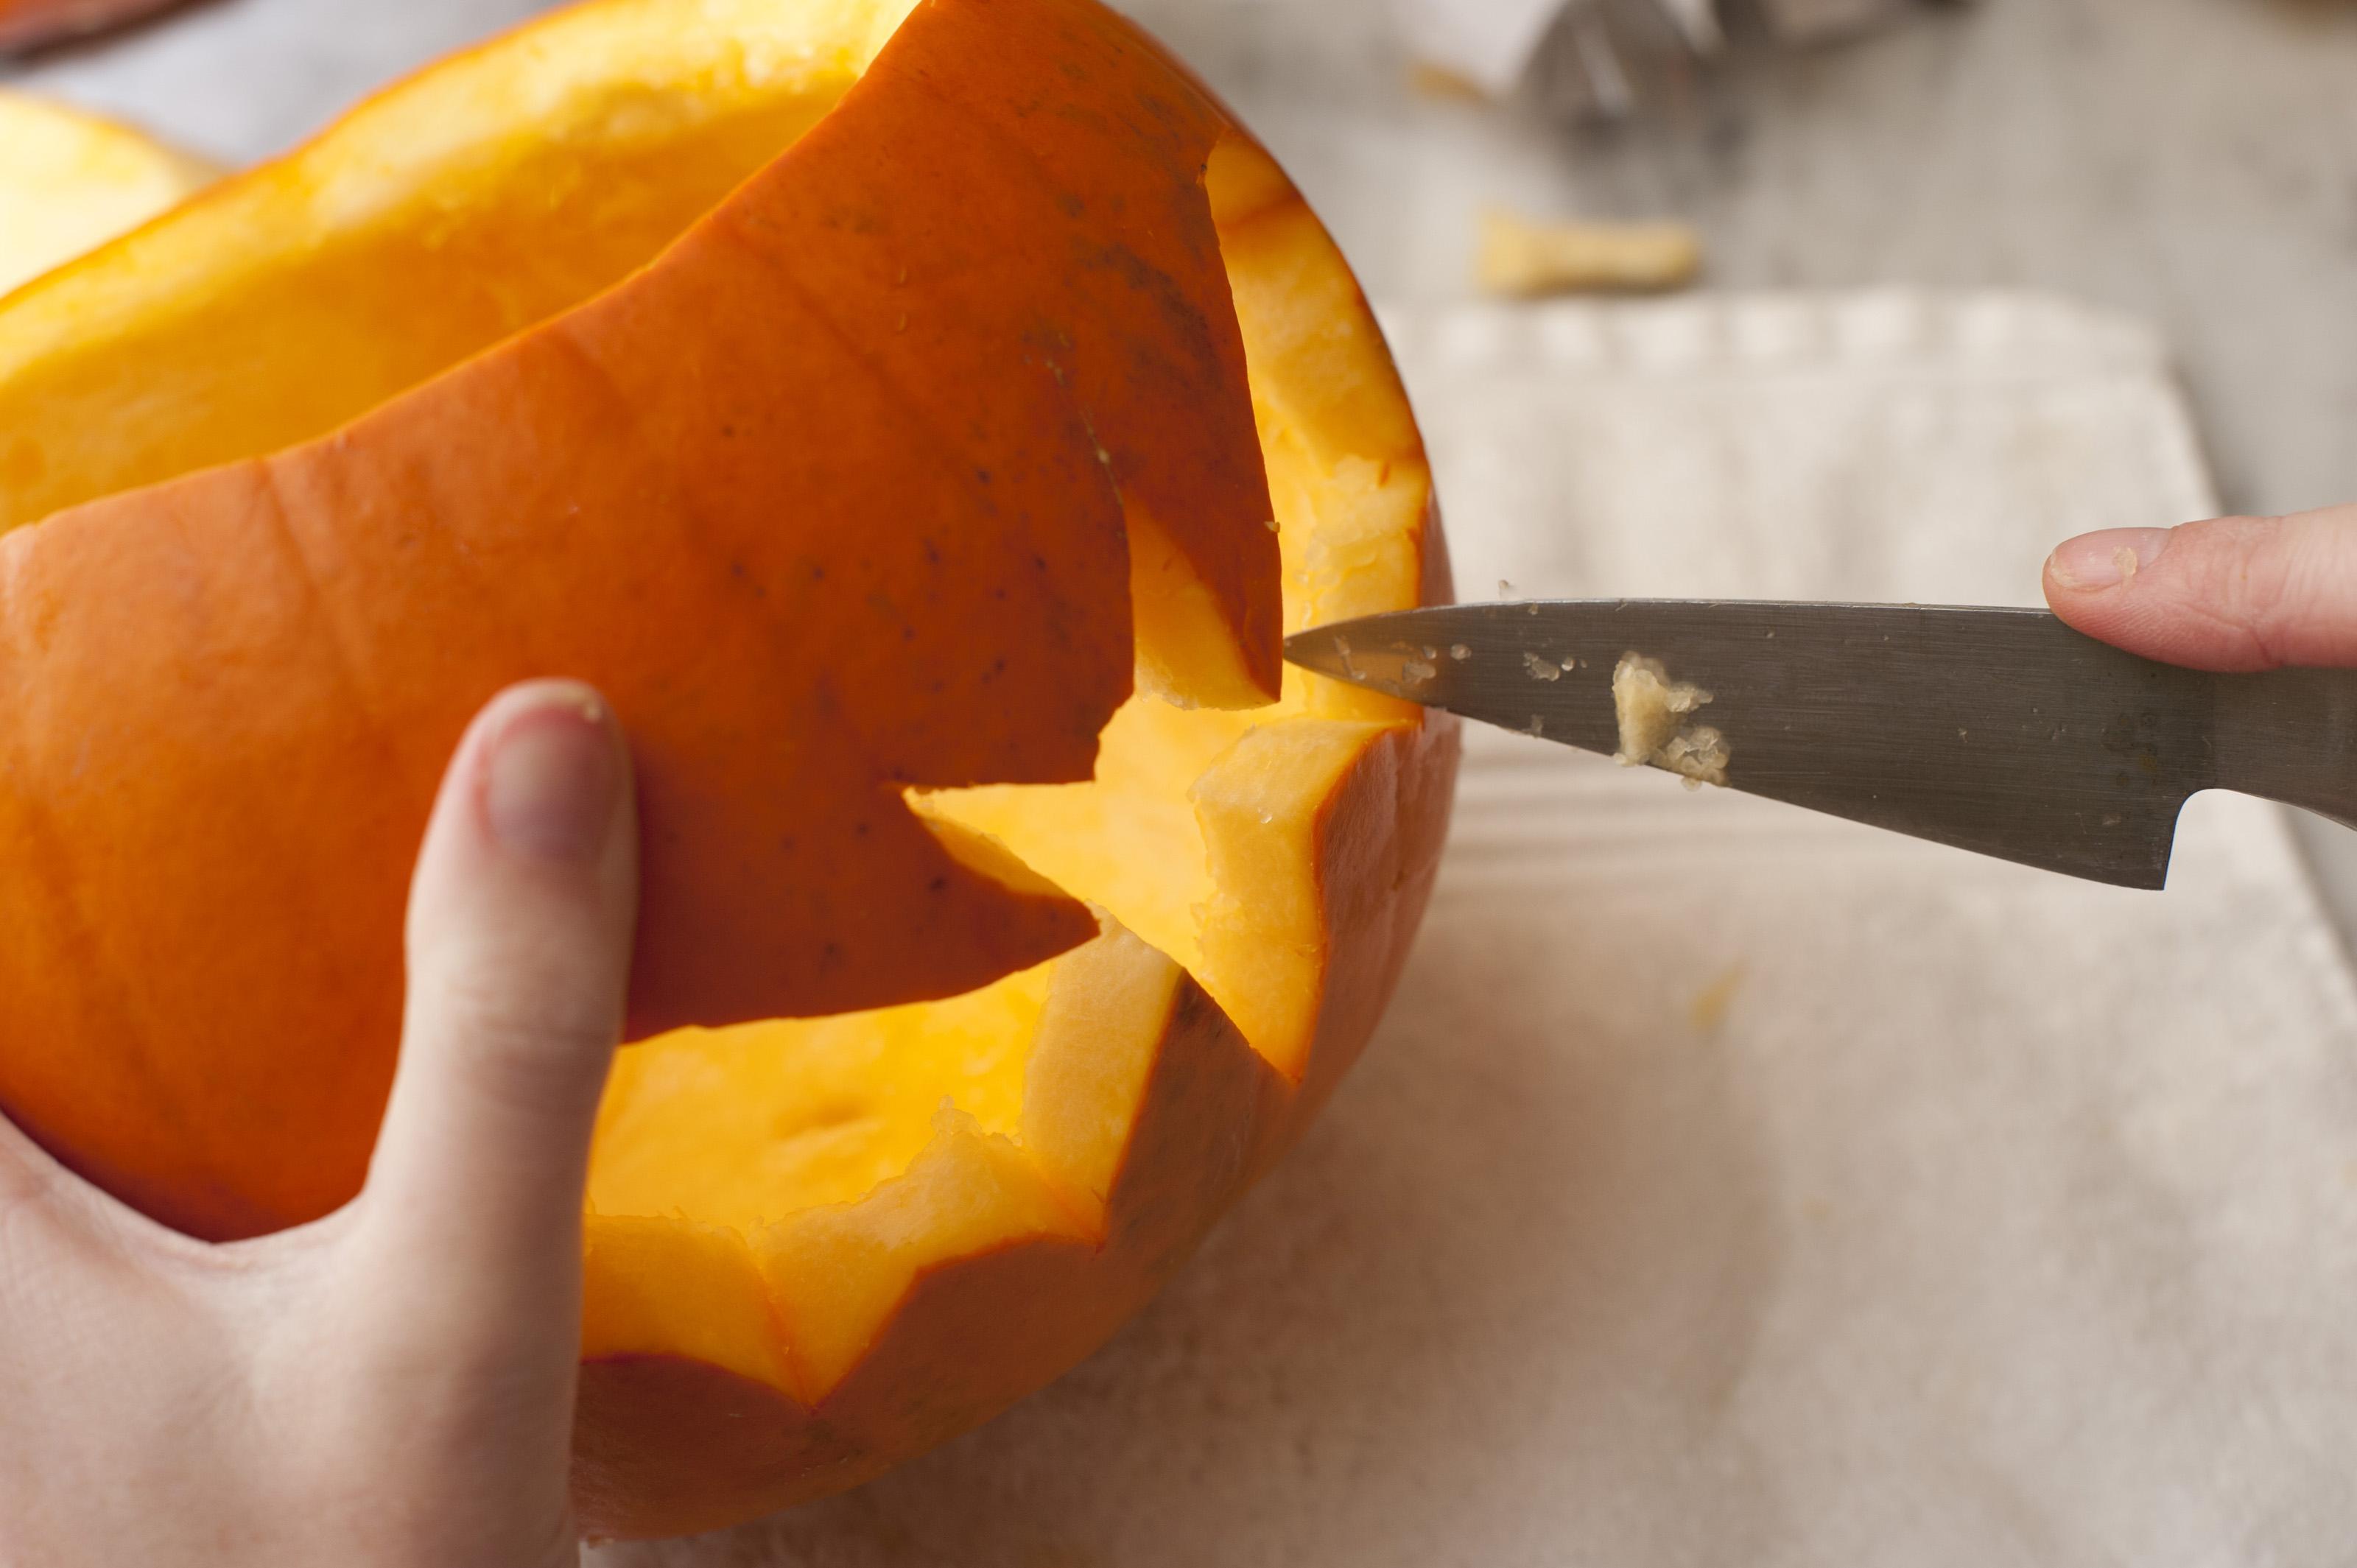 Image Of Man Carving A Pumpkin Lantern For Halloween